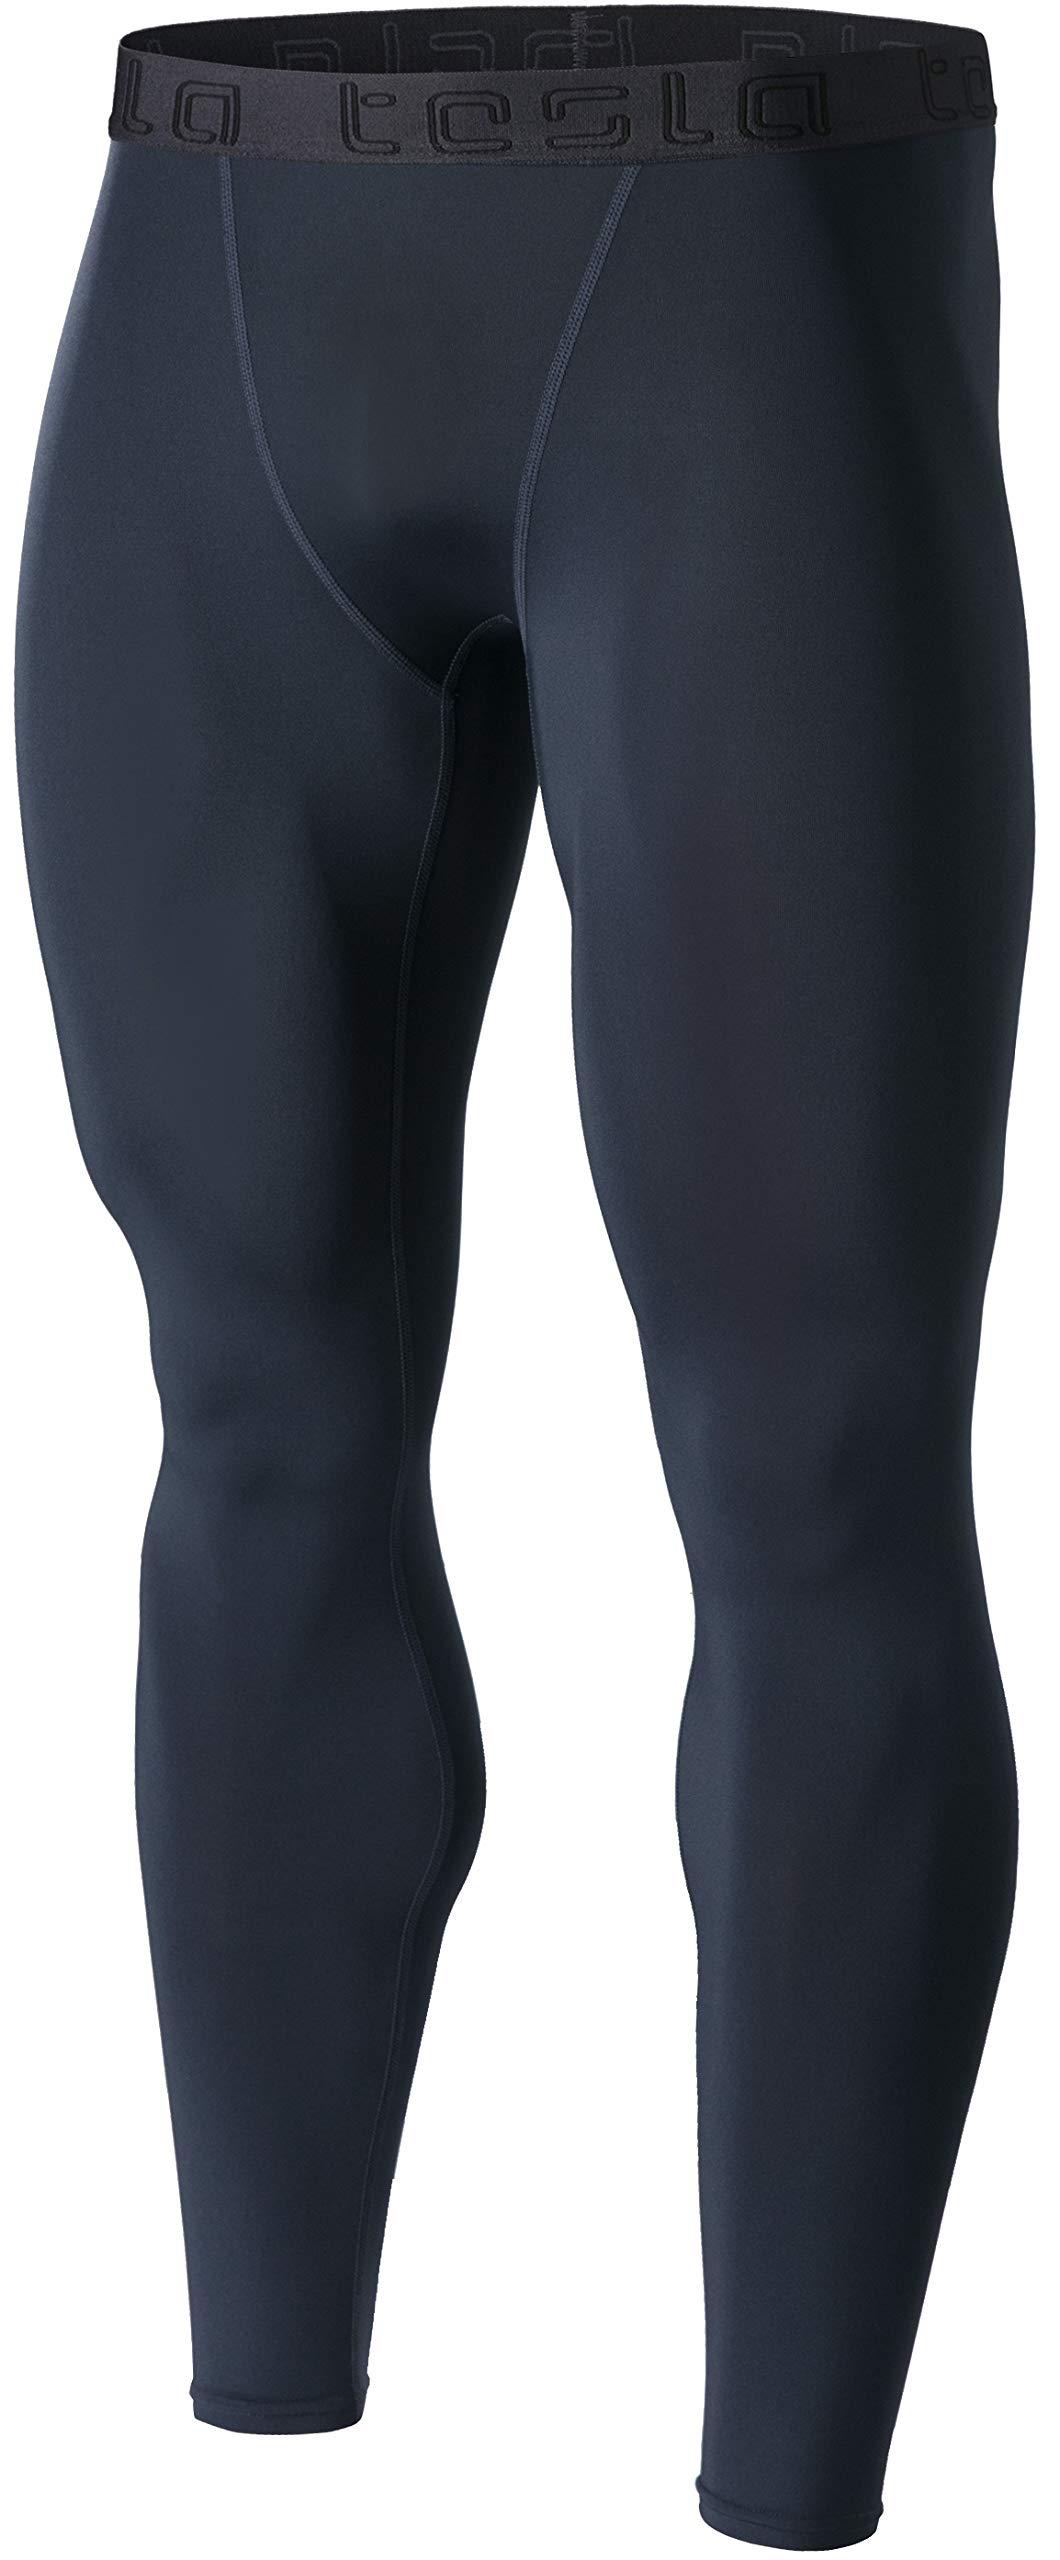 TSLA Men's Compression Pants Running Baselayer Cool Dry Sports Tights, Basic(mup09) - Charcoal, Medium by TSLA